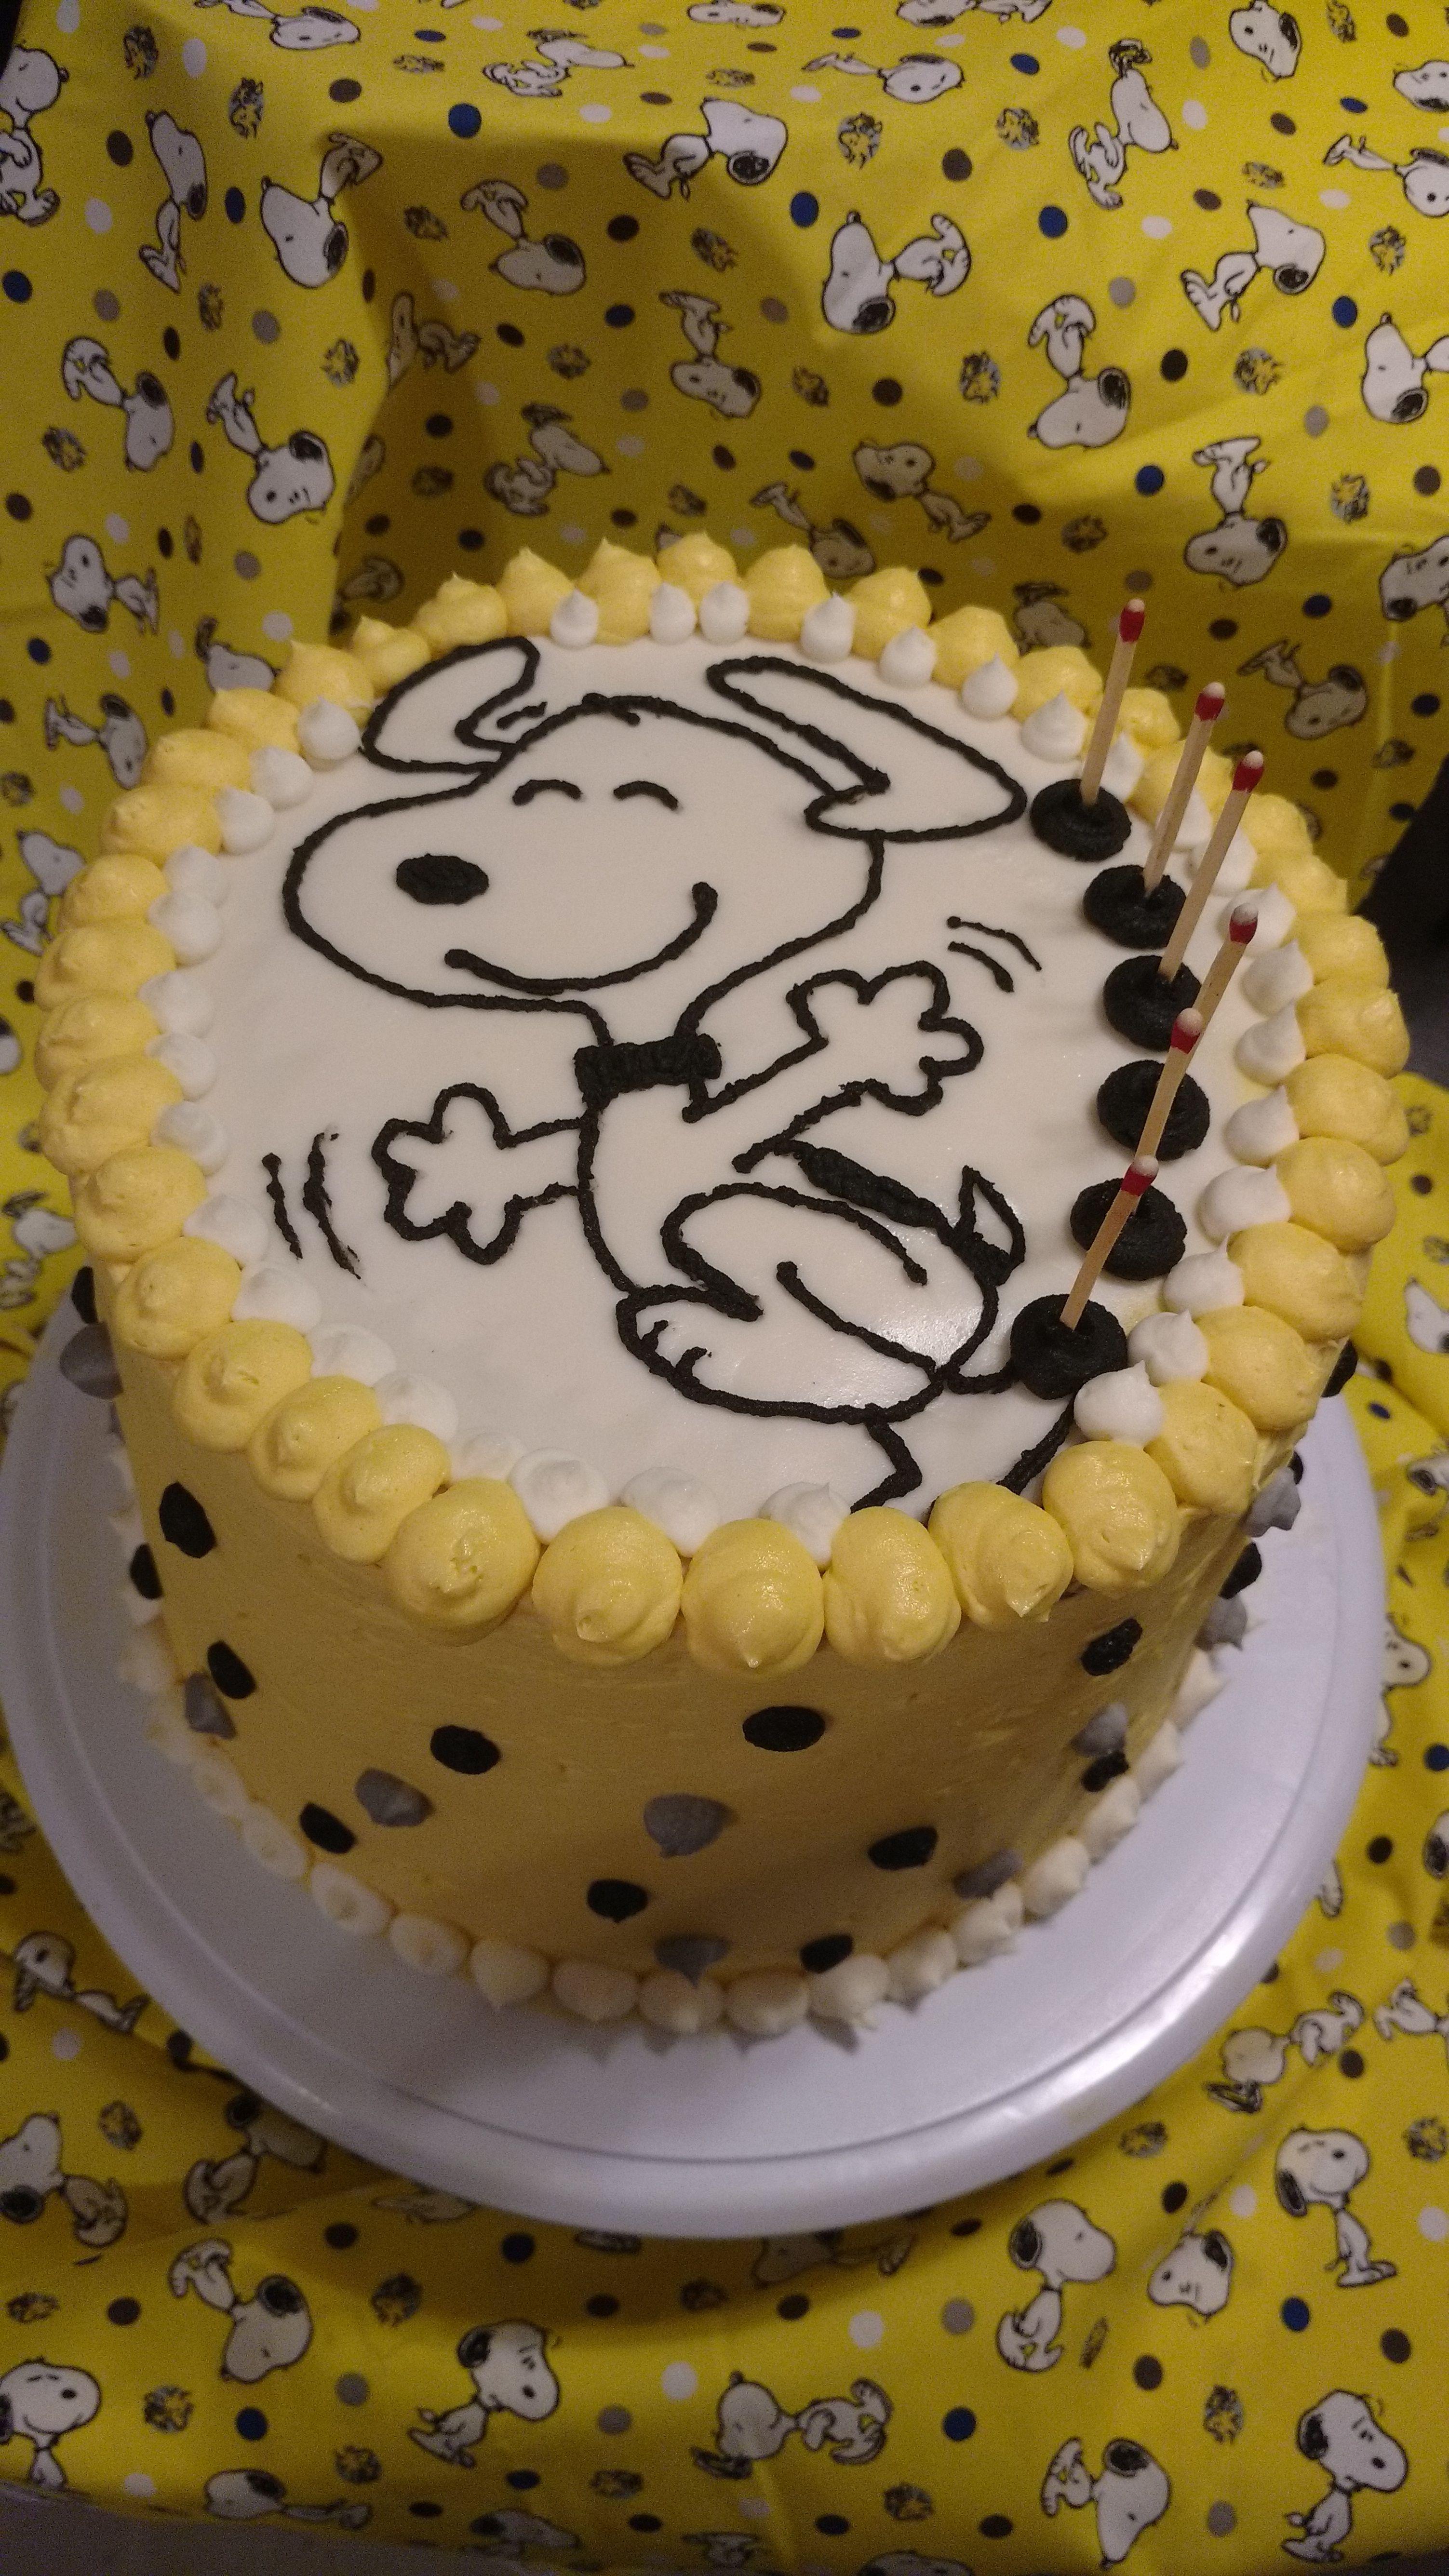 Snoopy Birthday Cake For My Fav Joe Cool Who Turned 60